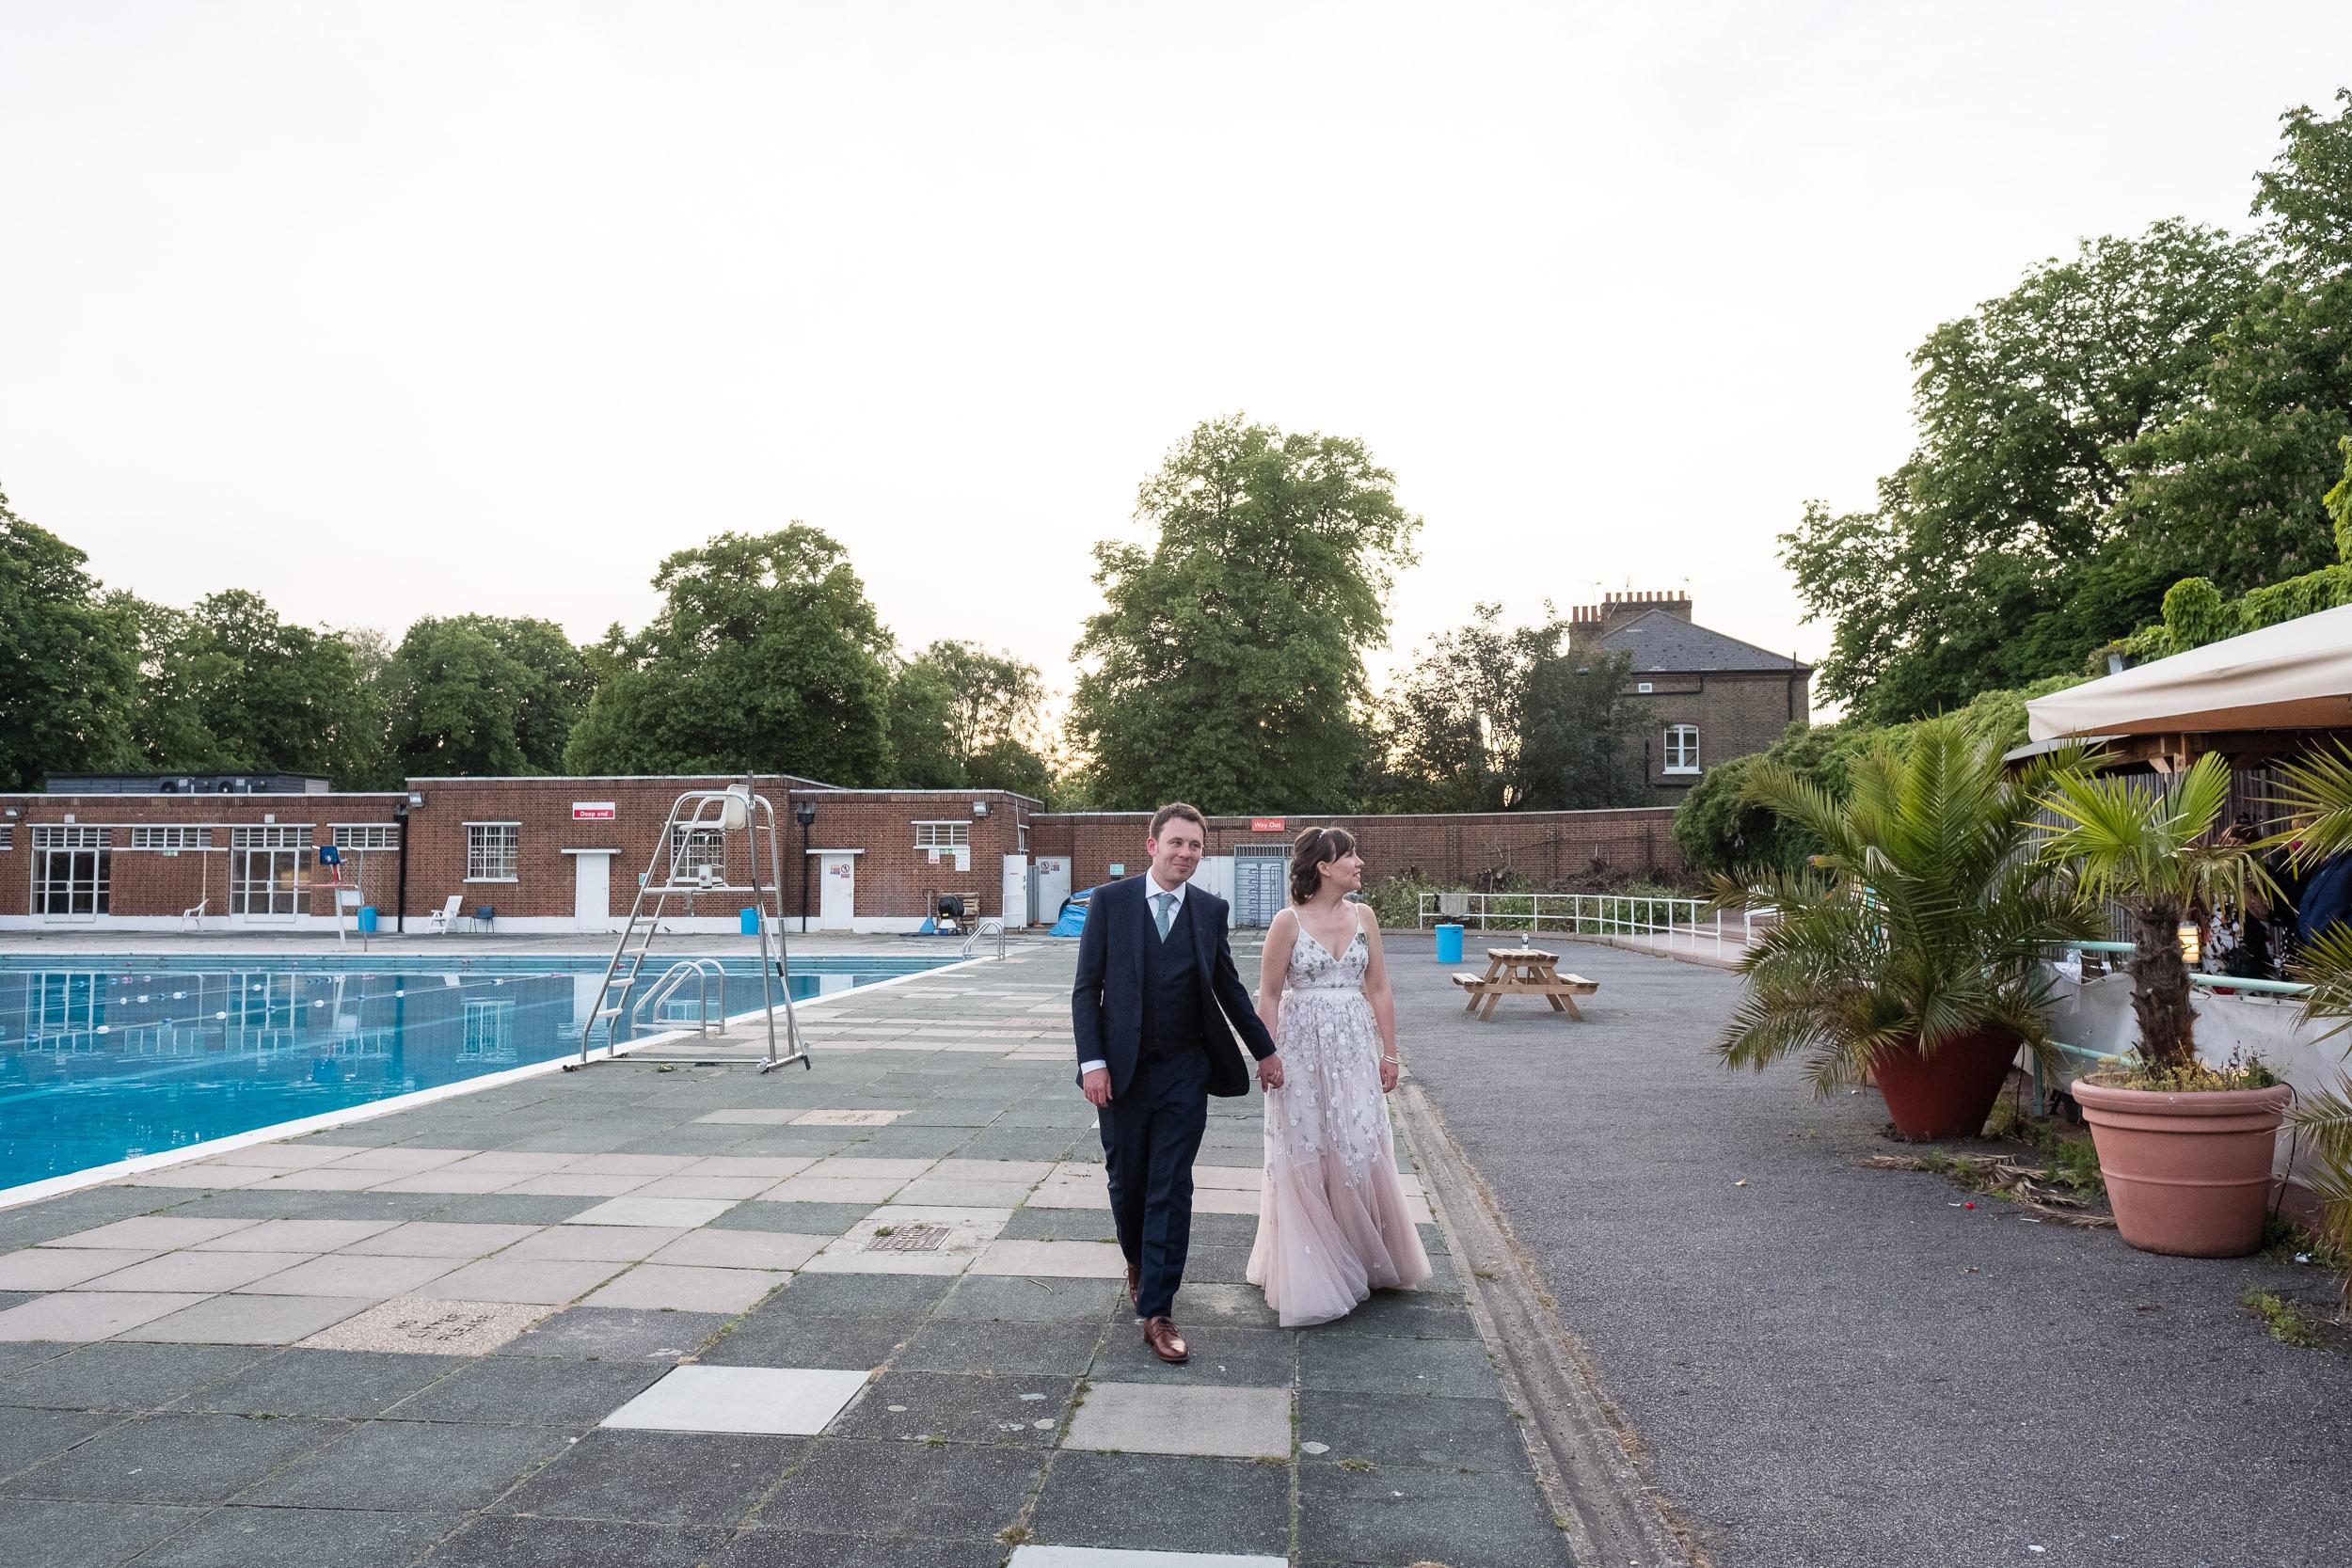 brockwell-lido-brixton-herne-hill-wedding-403.jpg